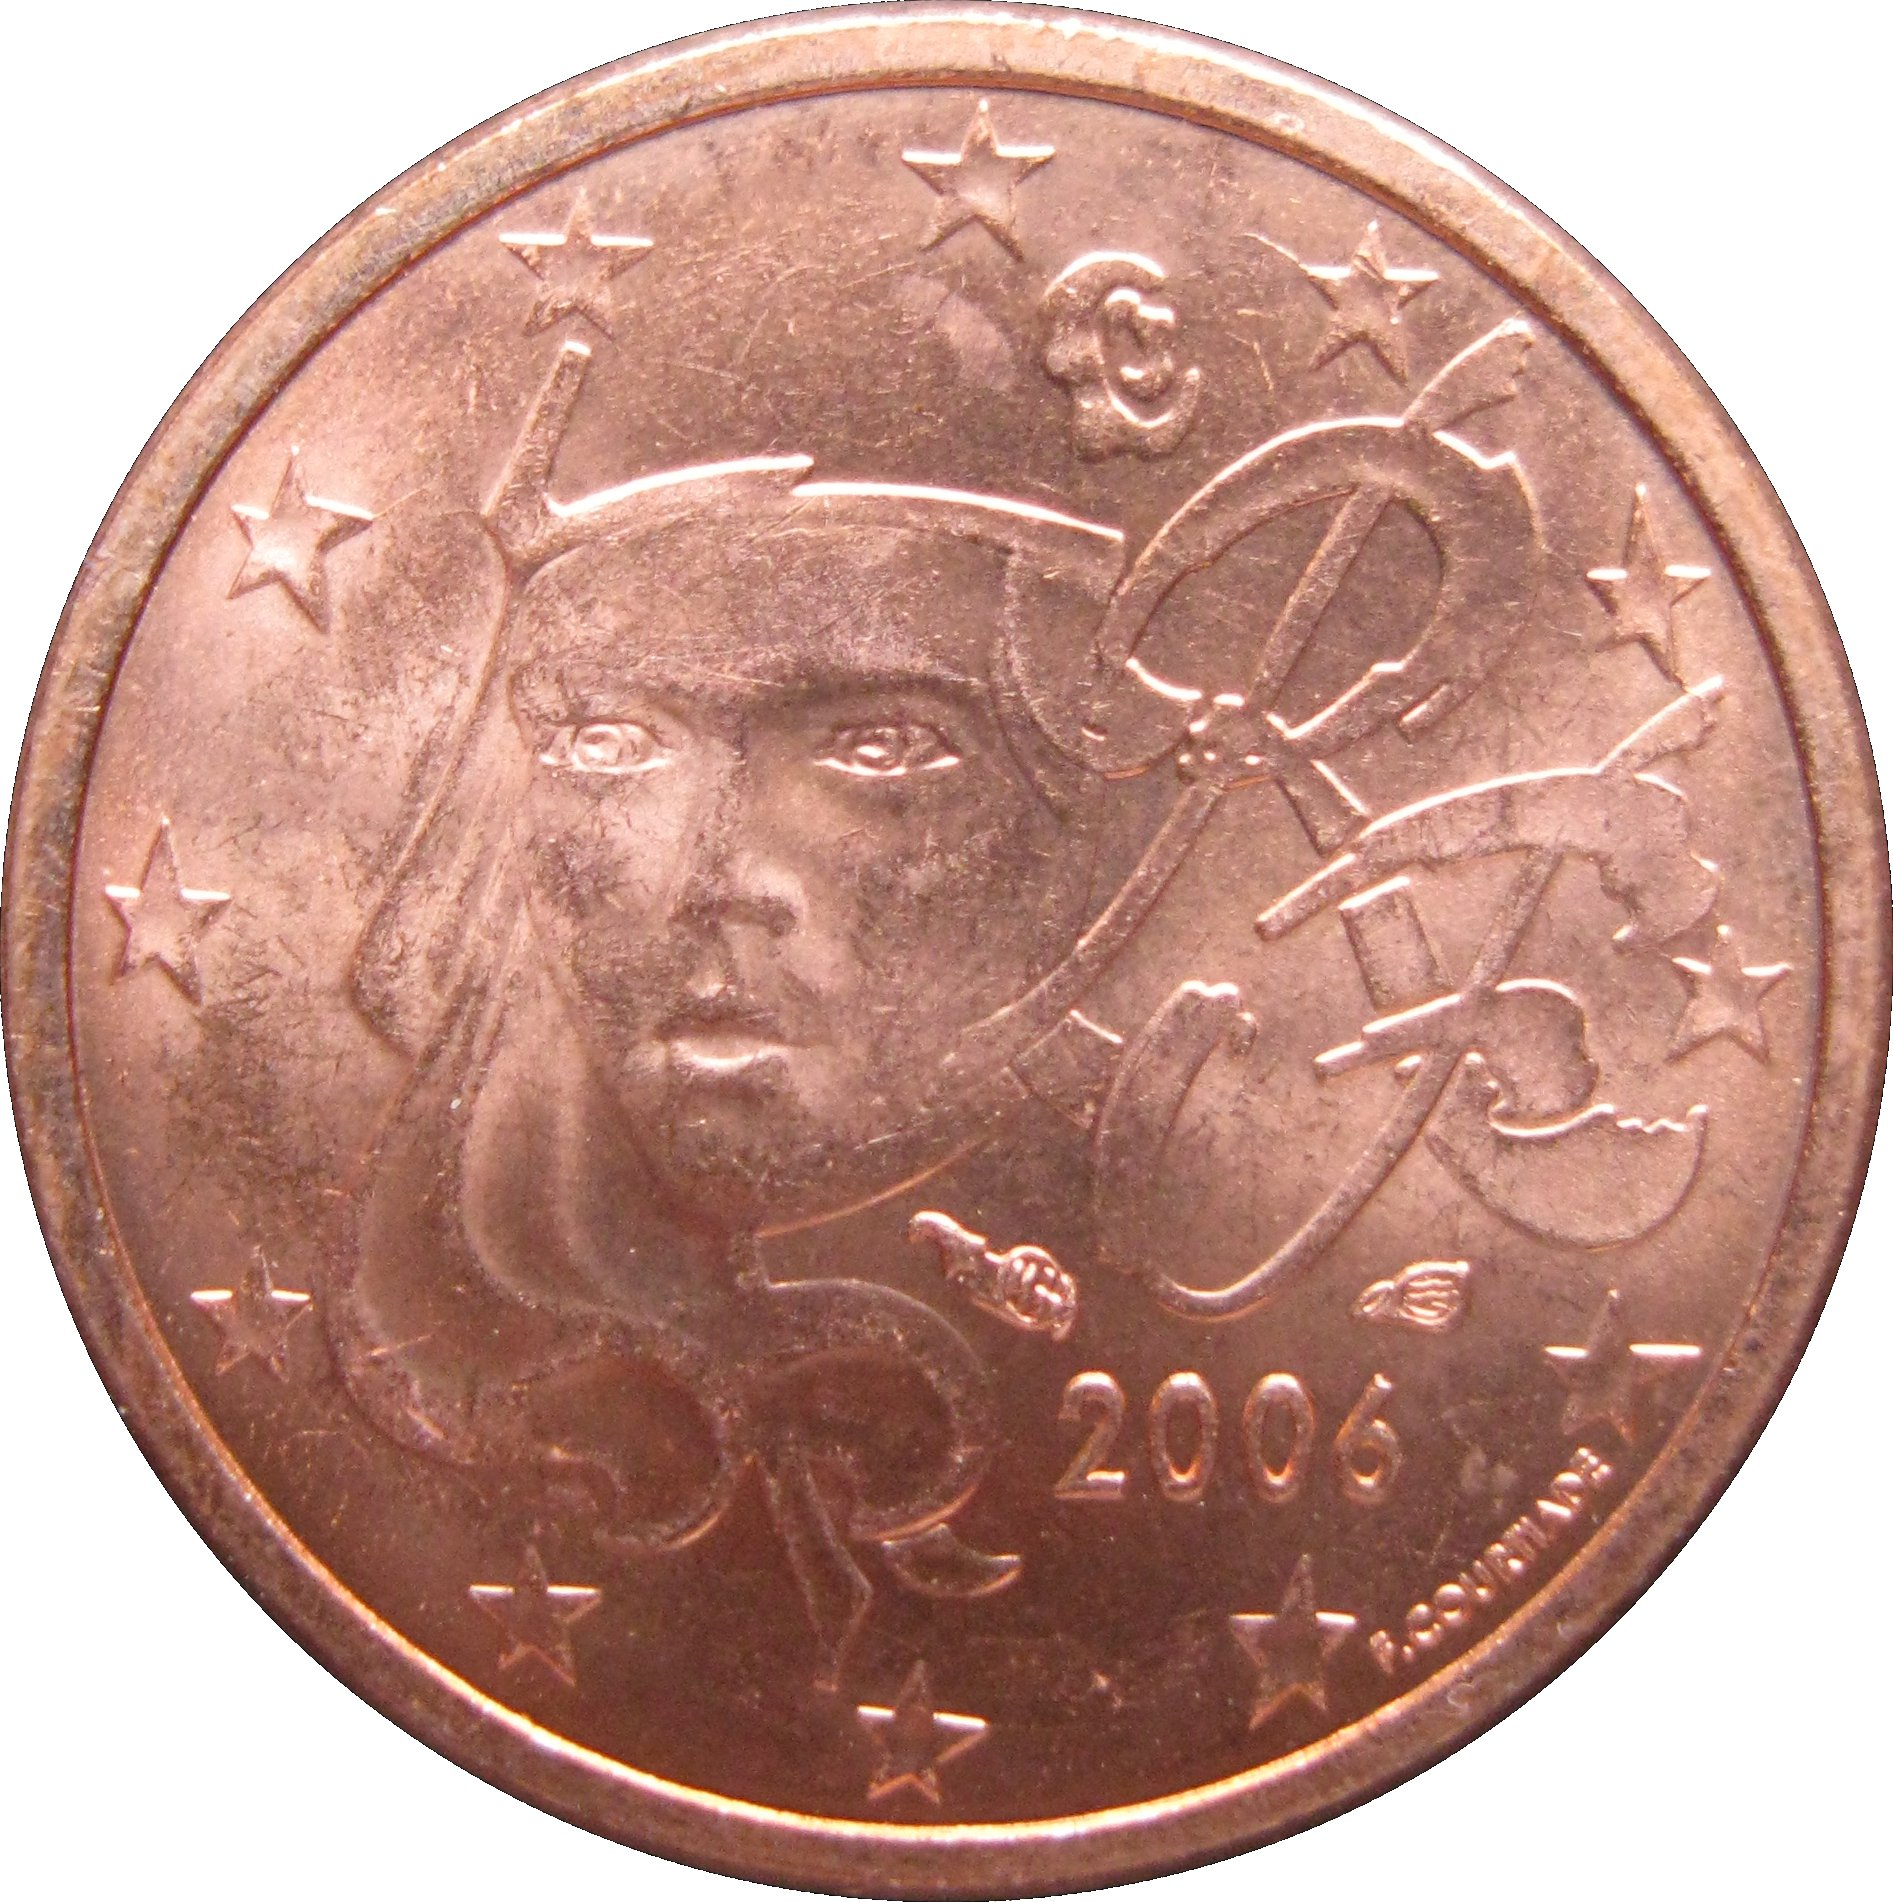 1 Euro Cent - France – Numista